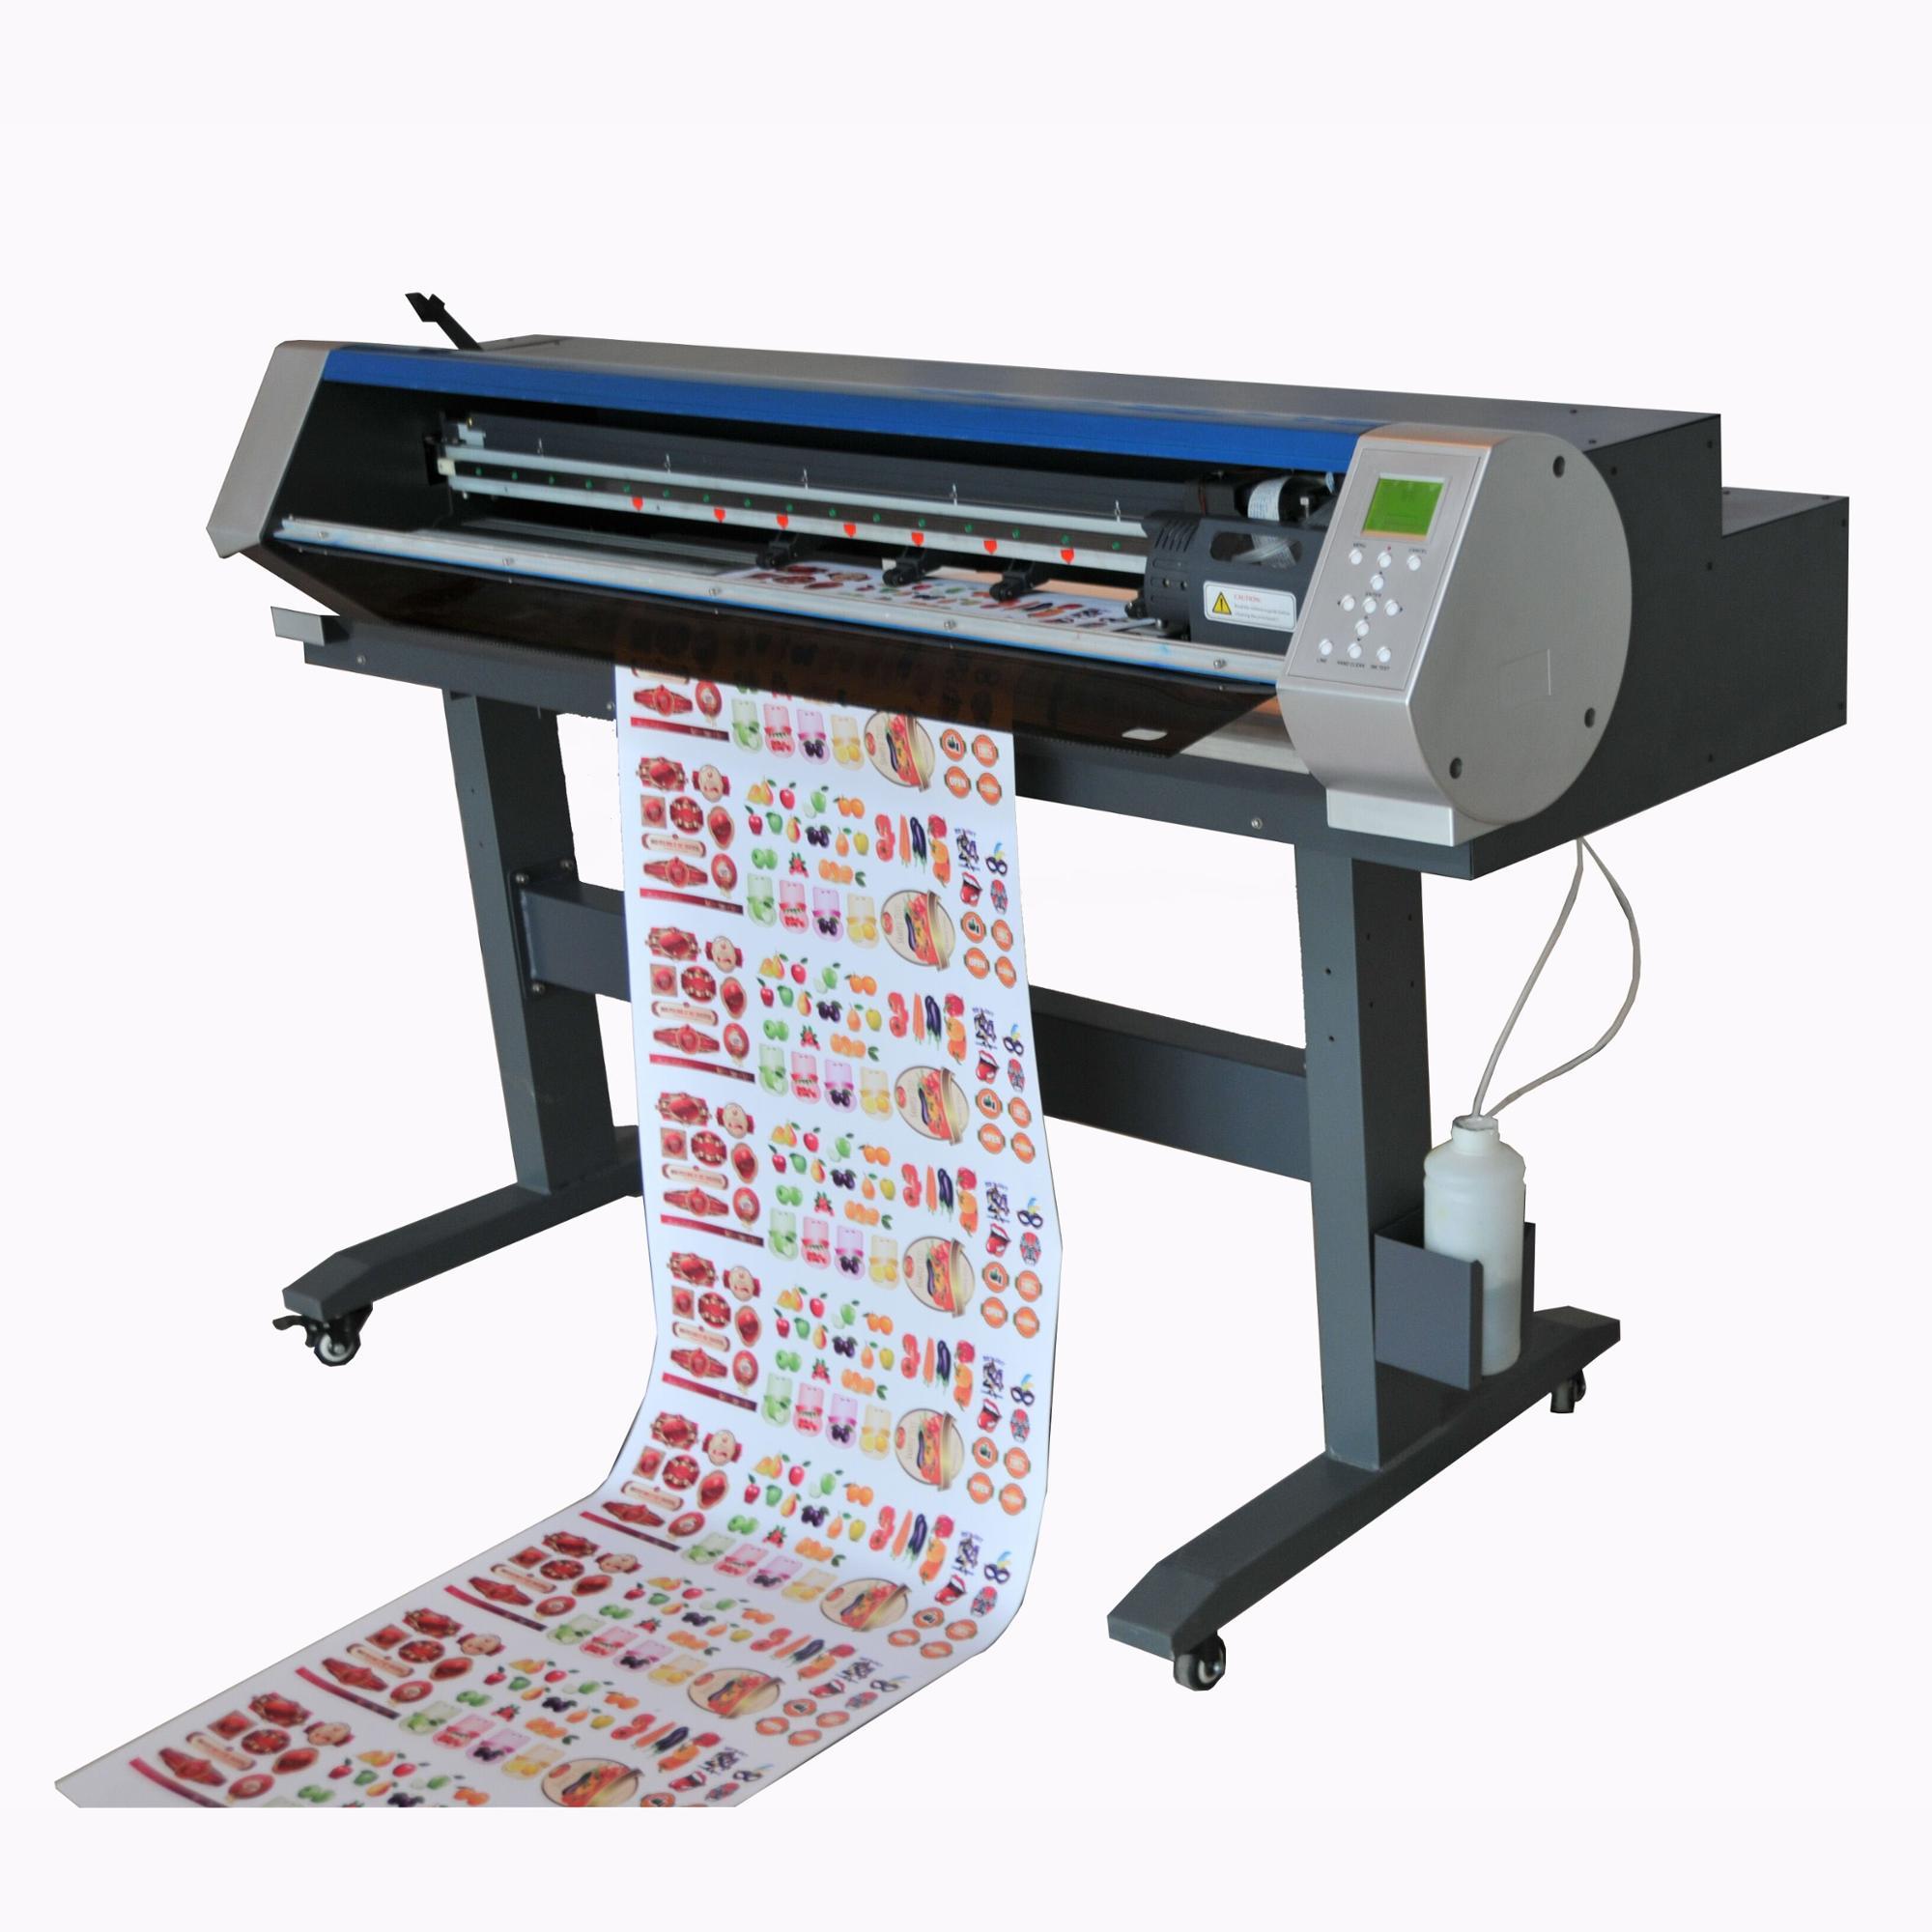 Tecjet Digital Vinyl Printer Die Cut Machine Paper Malaysia Desktop  Electric Cutter - Buy Digital Vinyl Printer Cutter,Die Cut Machine  Paper,Die Cut